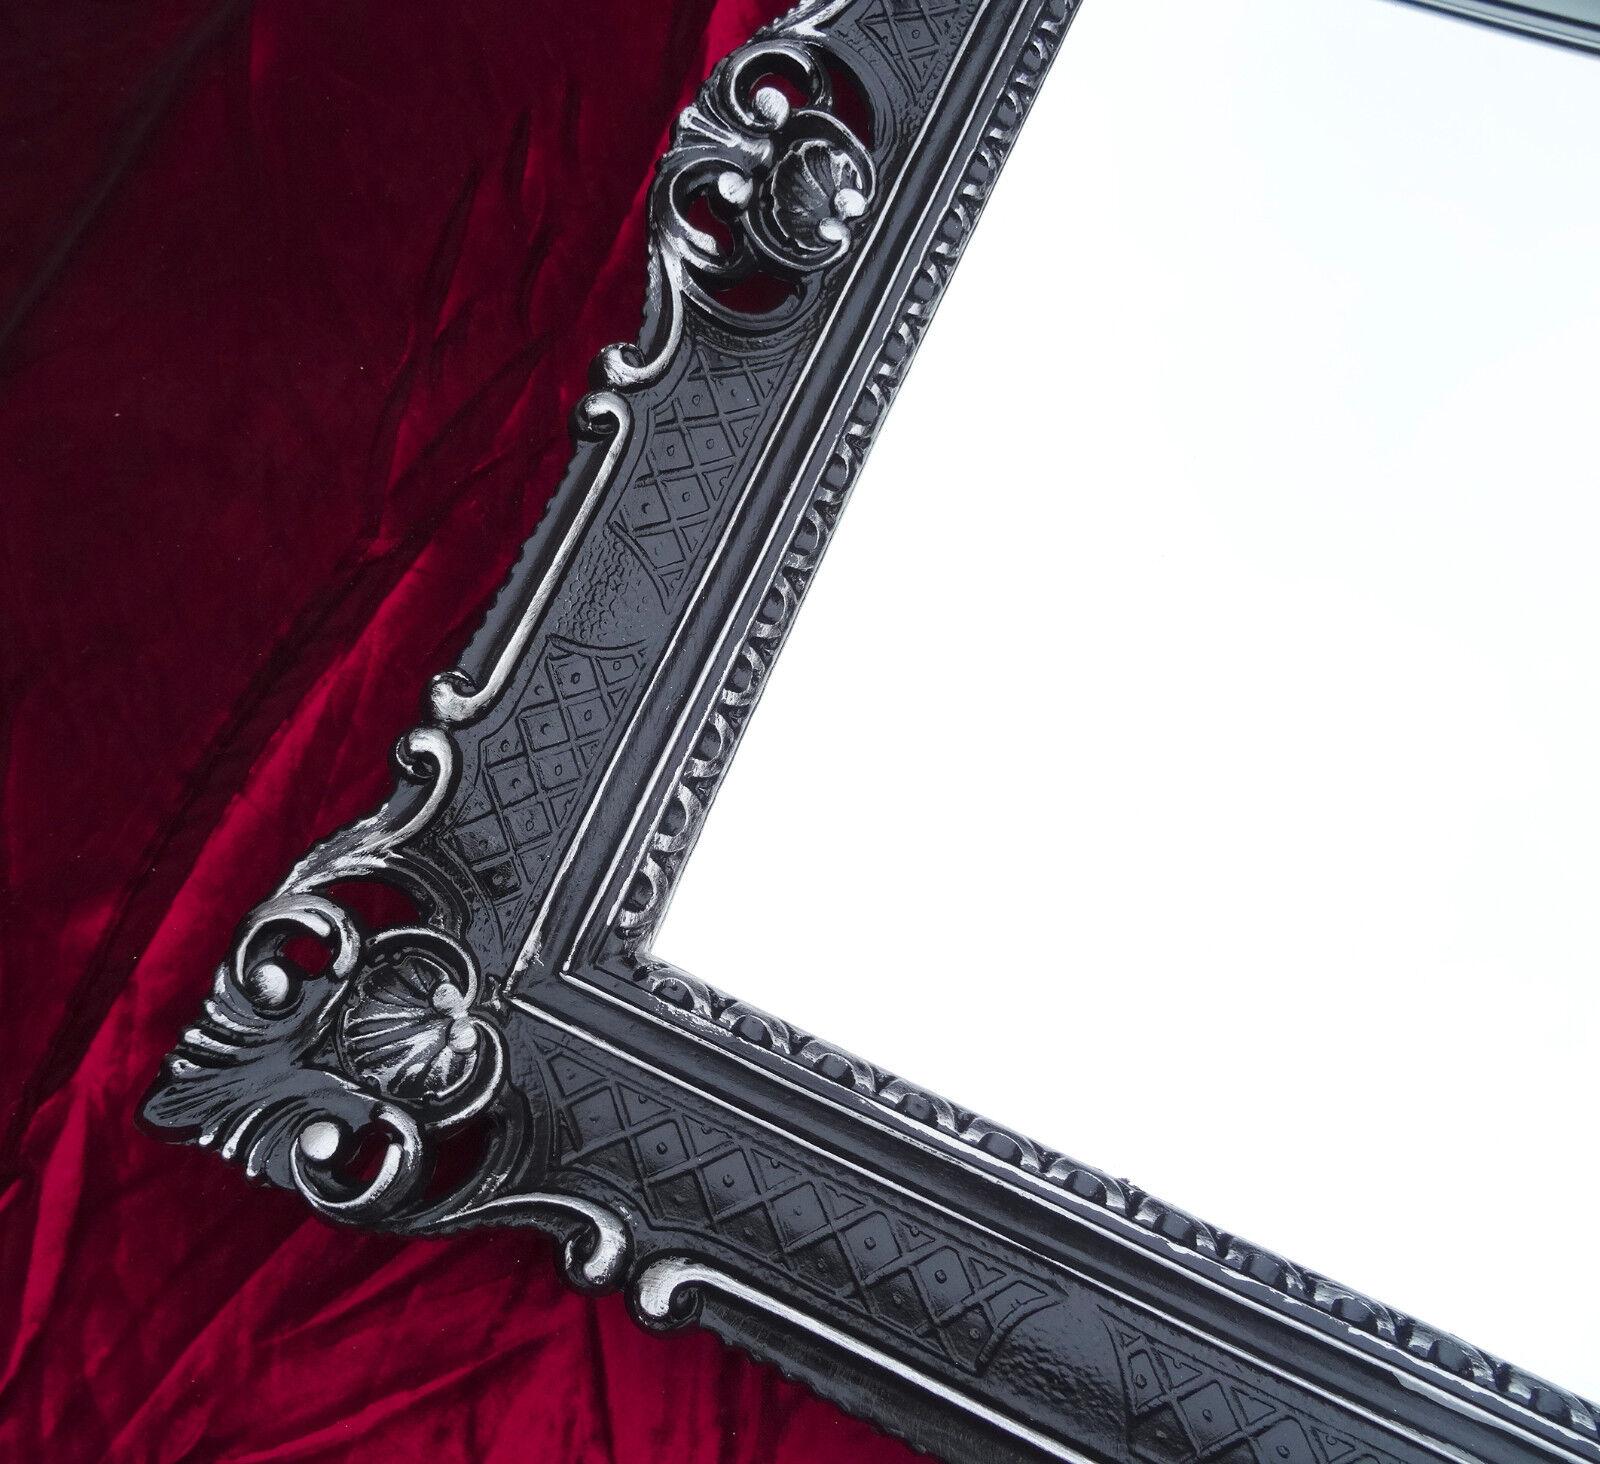 xxl wandspiegel spiegel schwarz silber antik barock rokoko. Black Bedroom Furniture Sets. Home Design Ideas